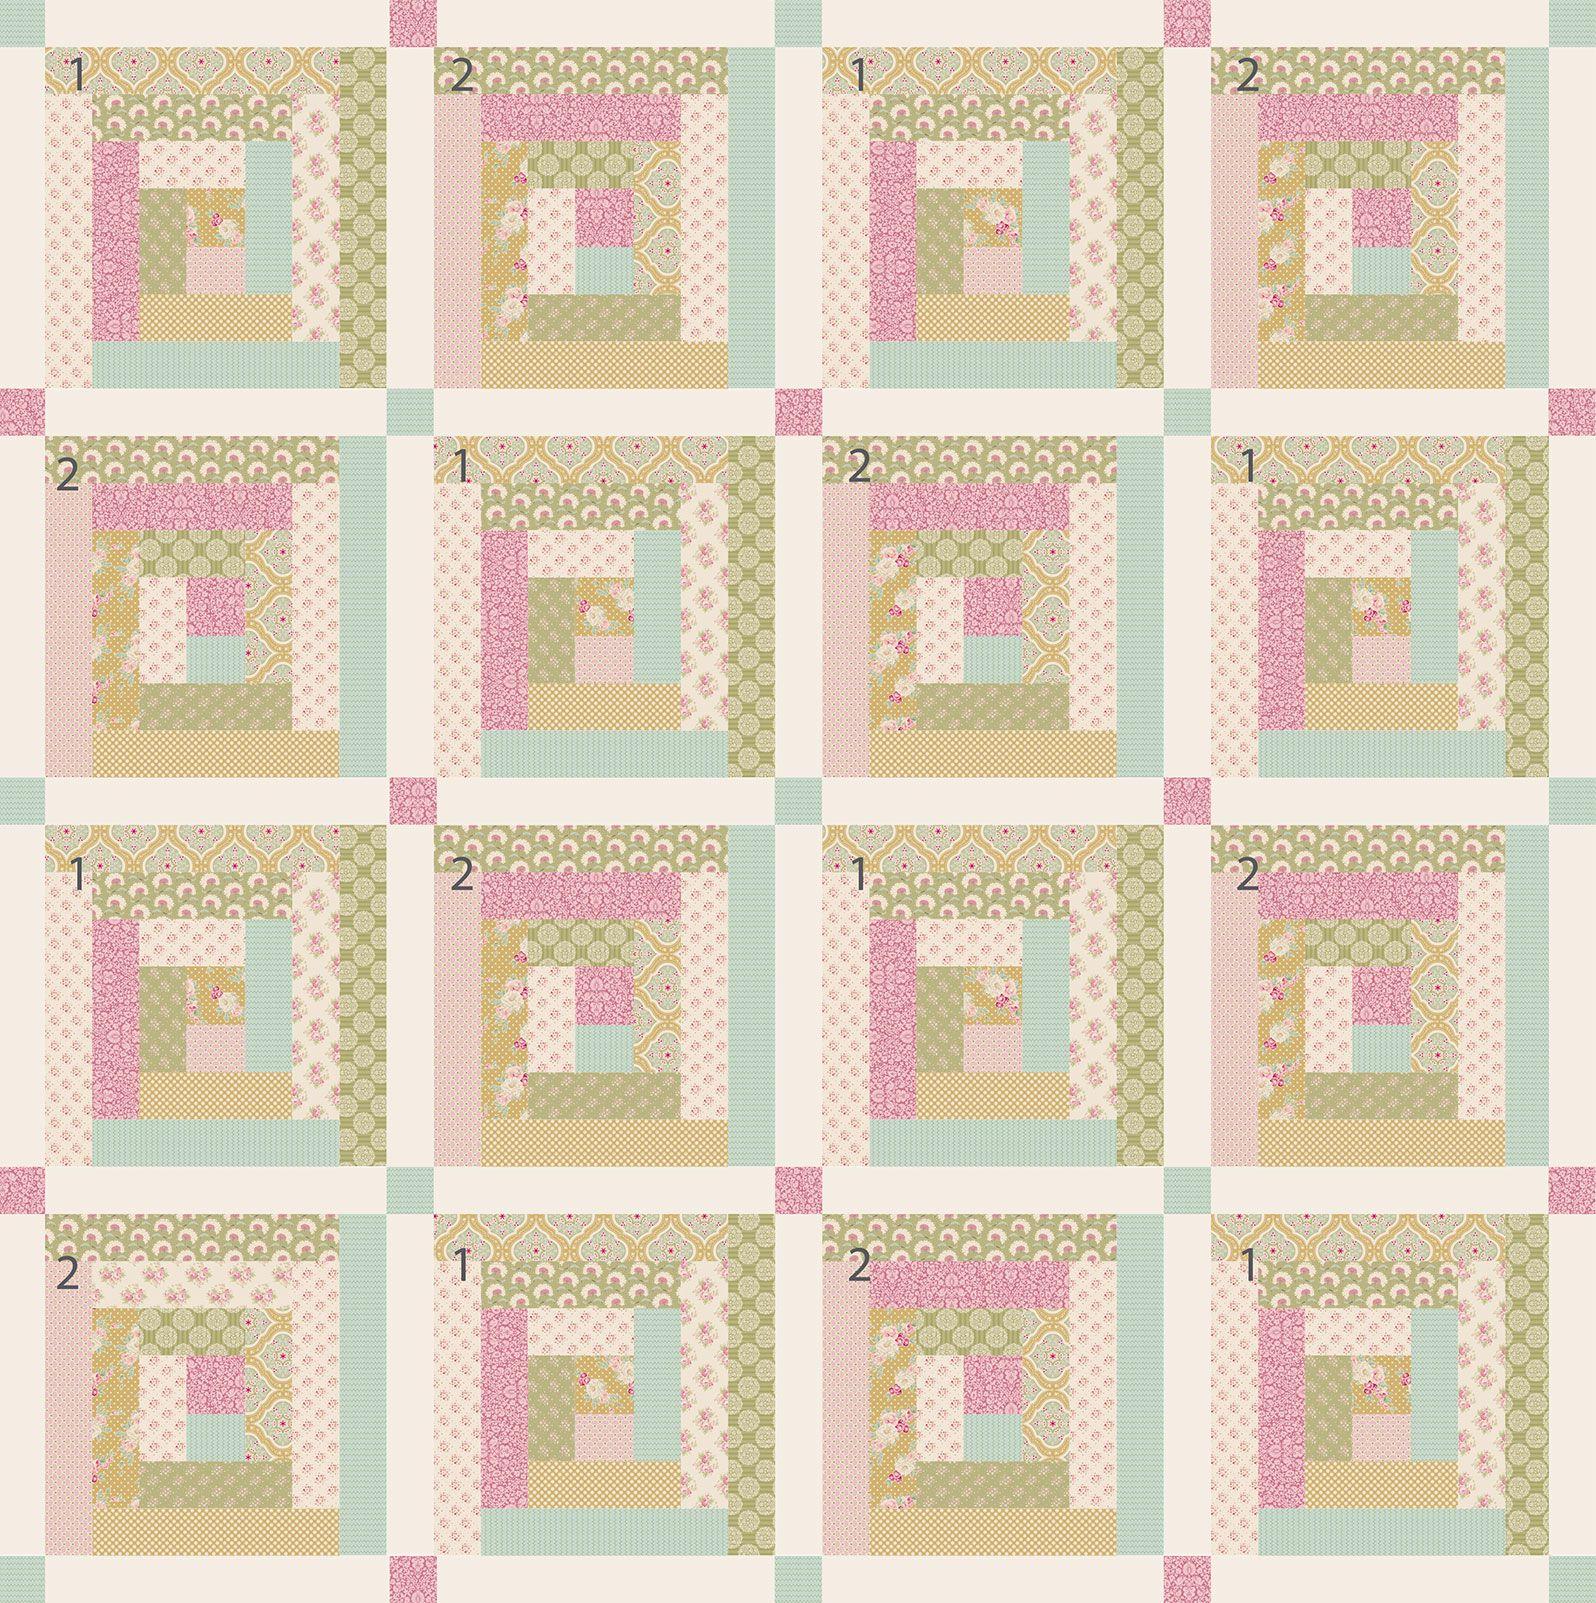 plaid tilda vert du printemps quilt en tissu fa on patchwork tissu couture quilt. Black Bedroom Furniture Sets. Home Design Ideas